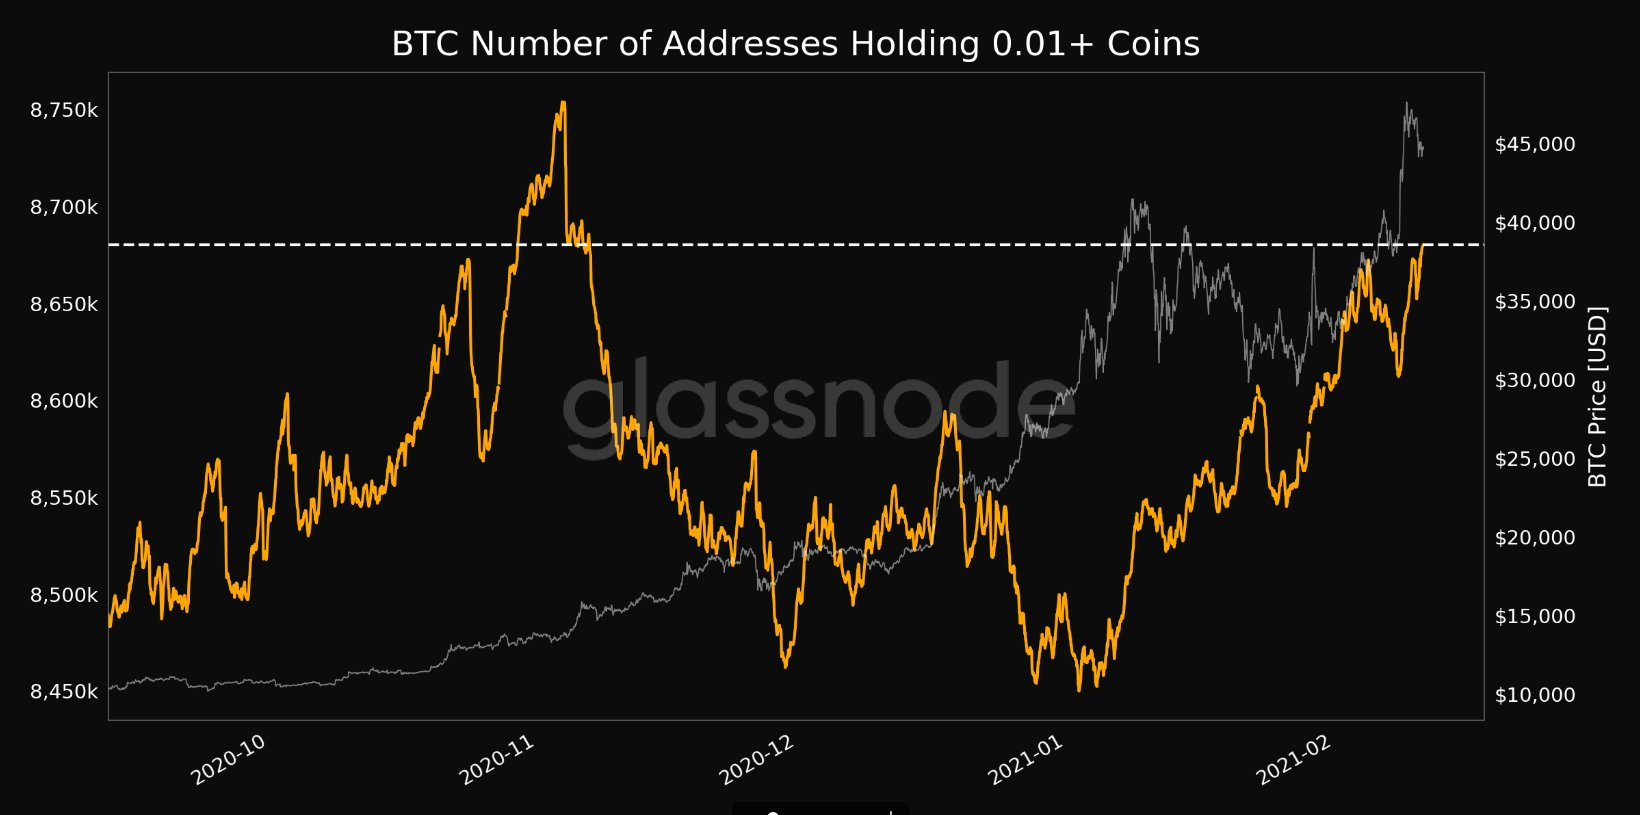 btc la rmb bitcoin local ahmedabad